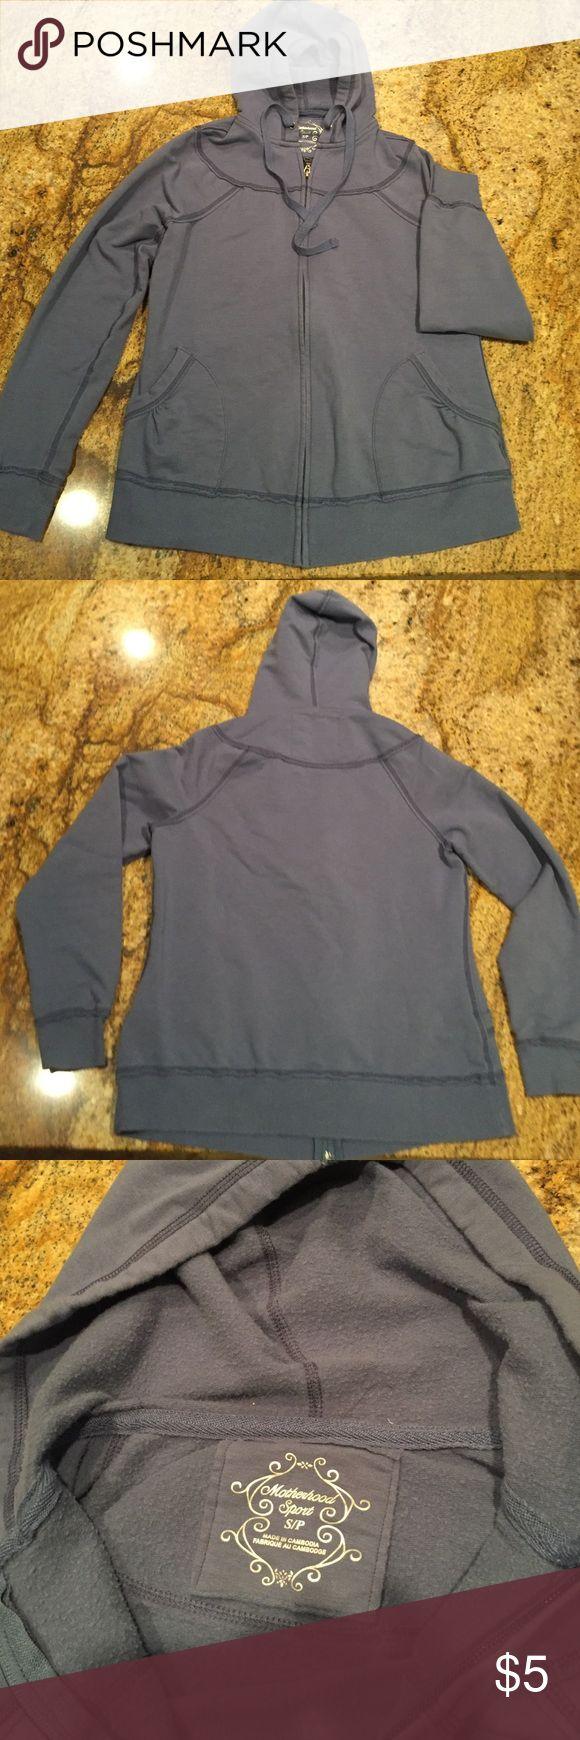 MATERNITY hoodie Motherhood maternity sweatshirt in good condition.  Zipper front with drawstring hood. Motherhood Maternity Tops Sweatshirts & Hoodies